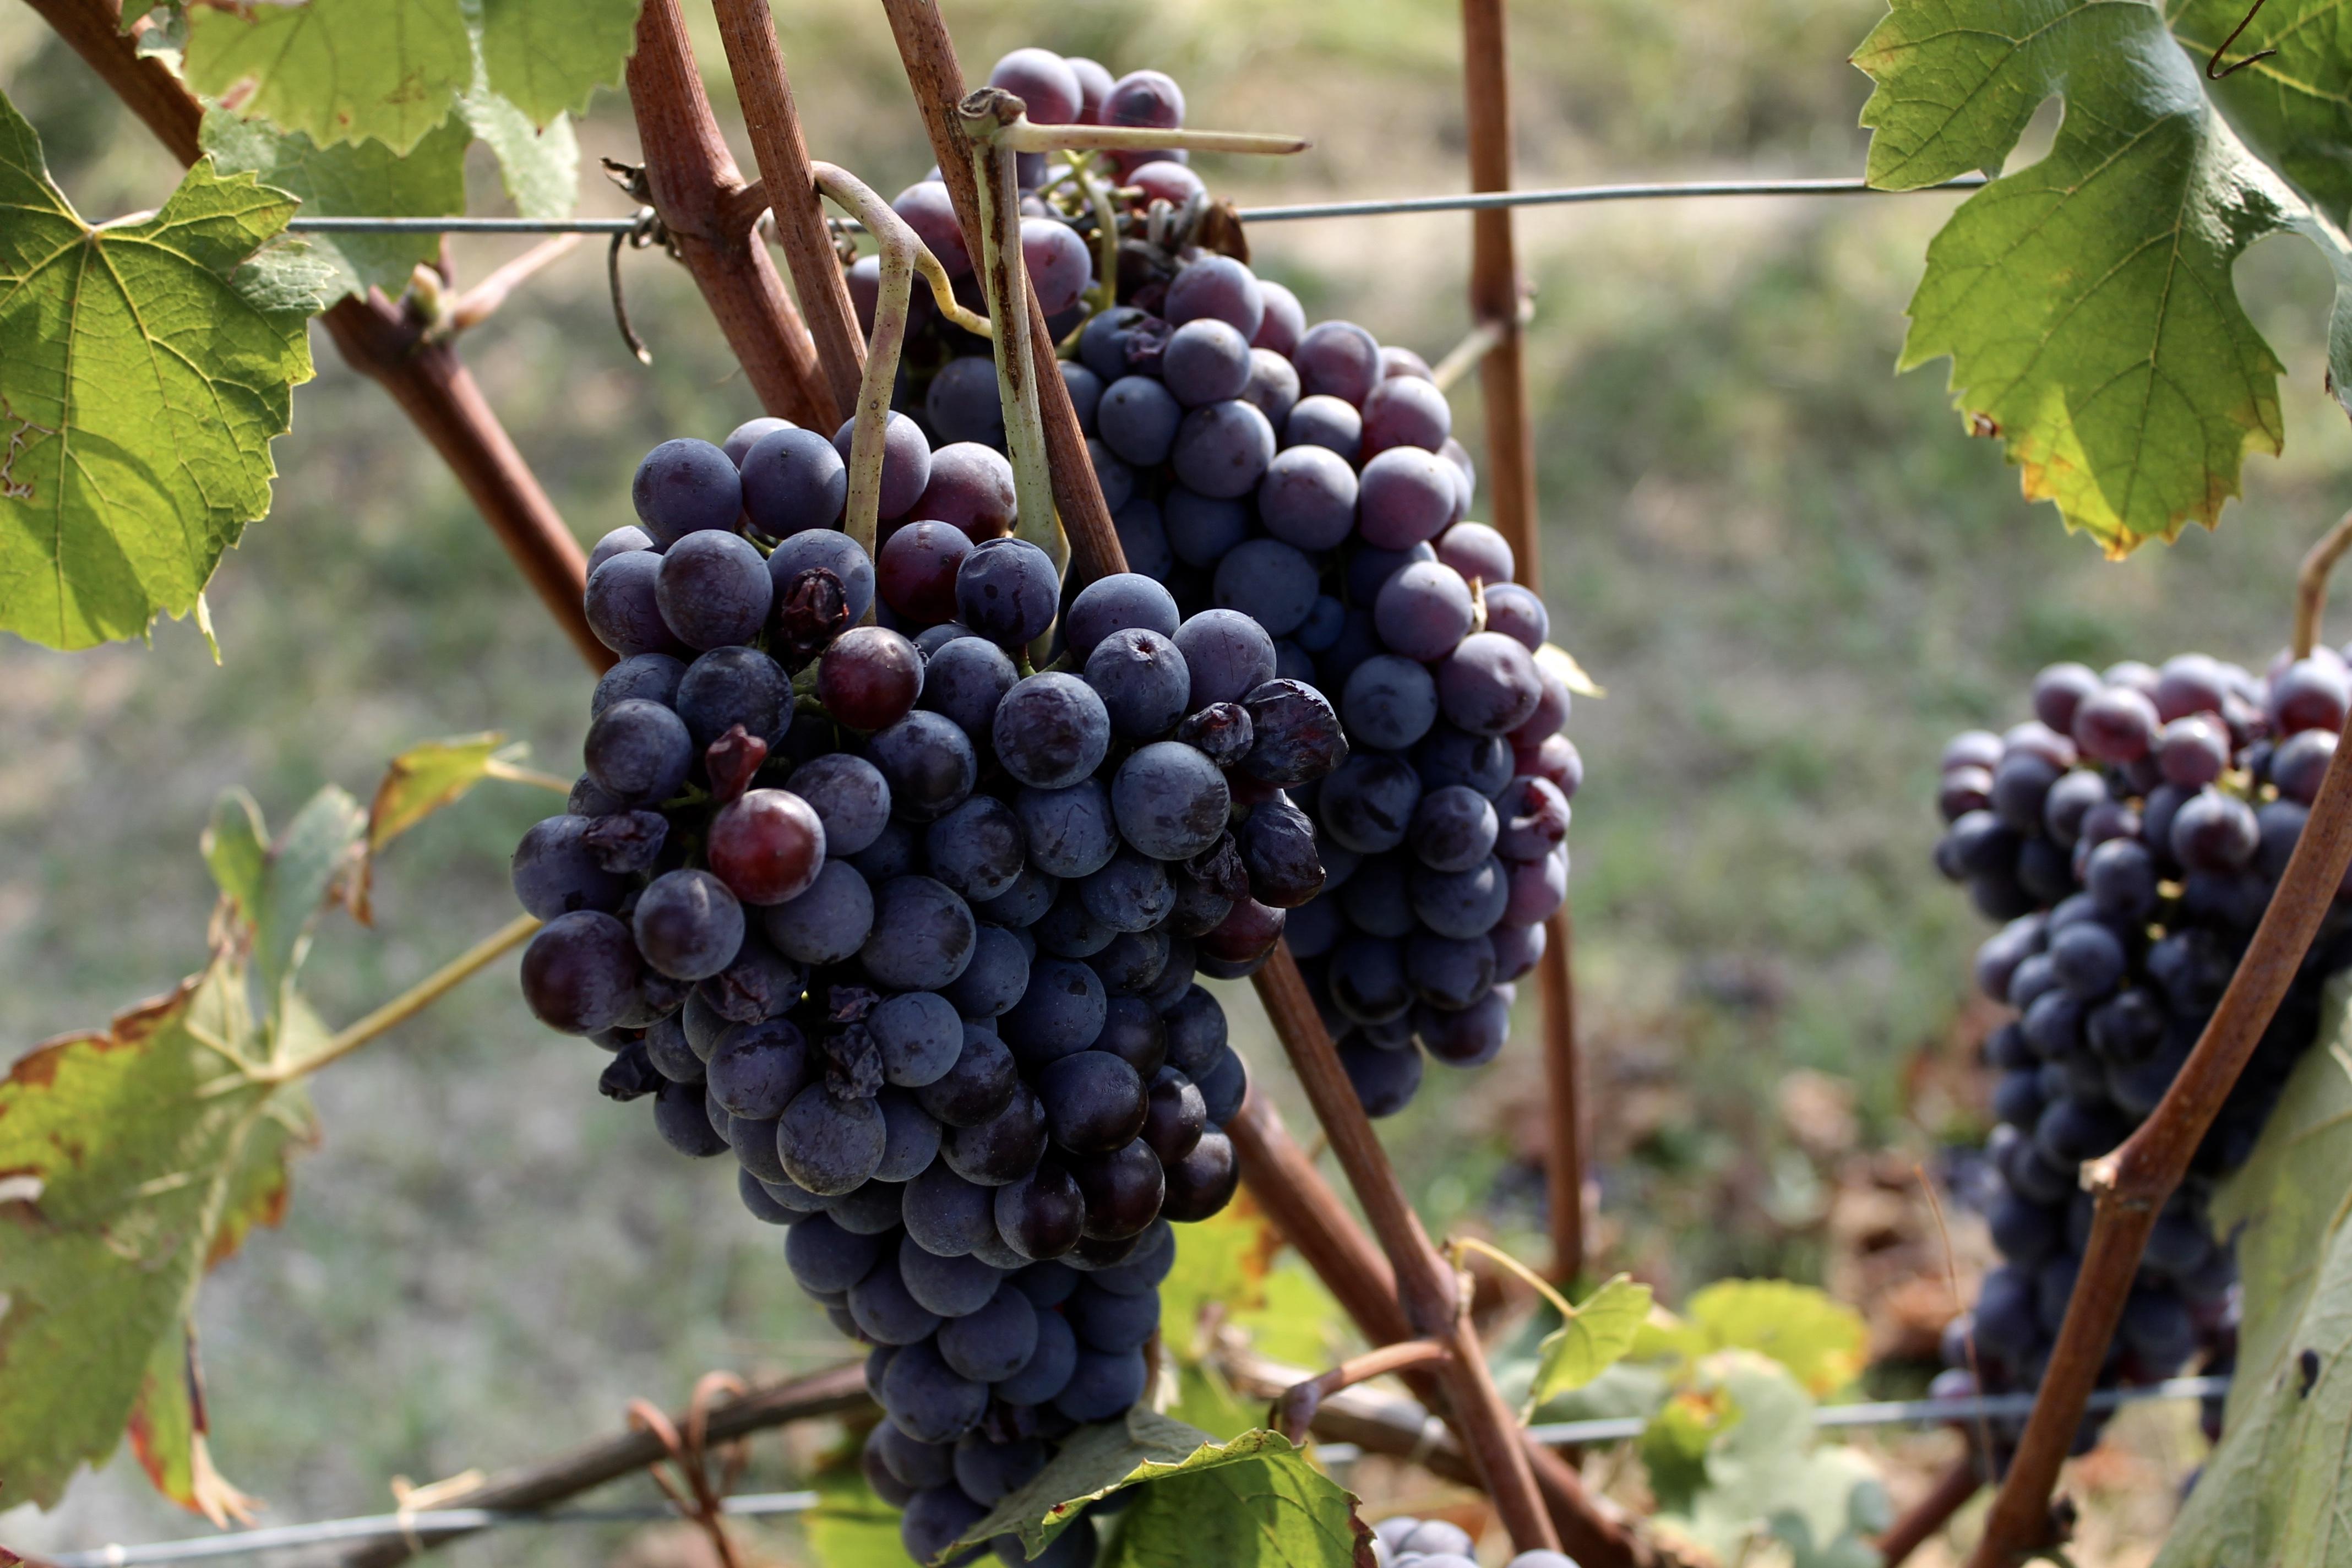 Grape Varieties in Barolo - Piemonte Girl